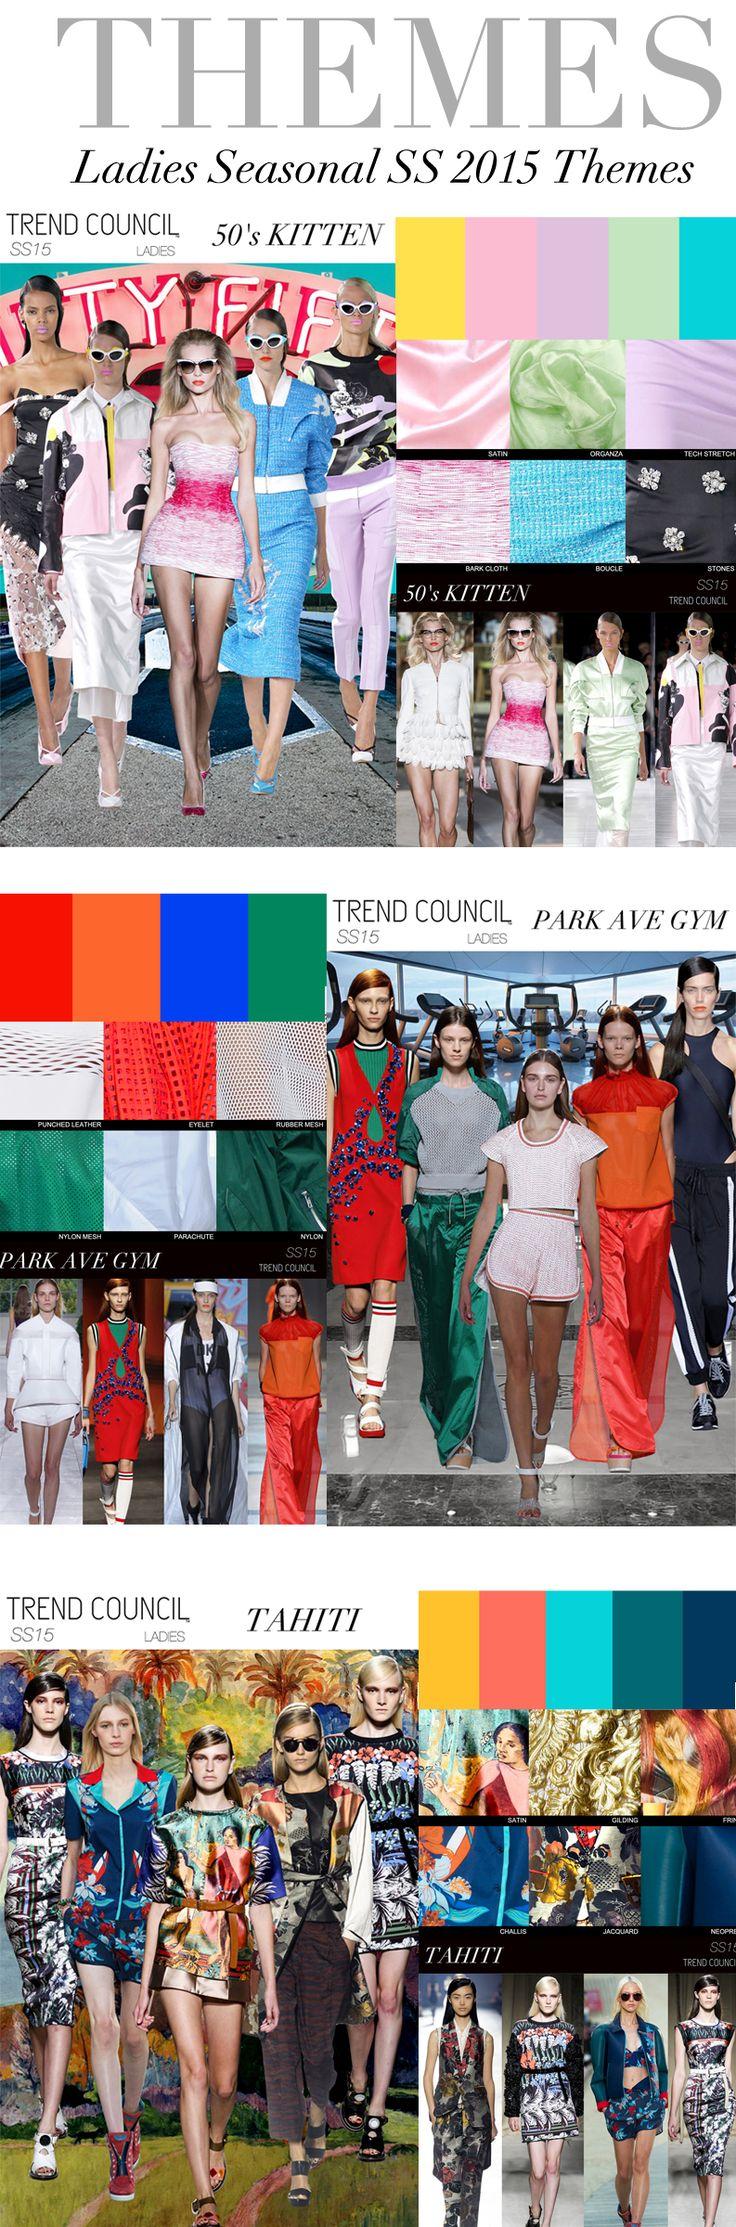 Trend Council